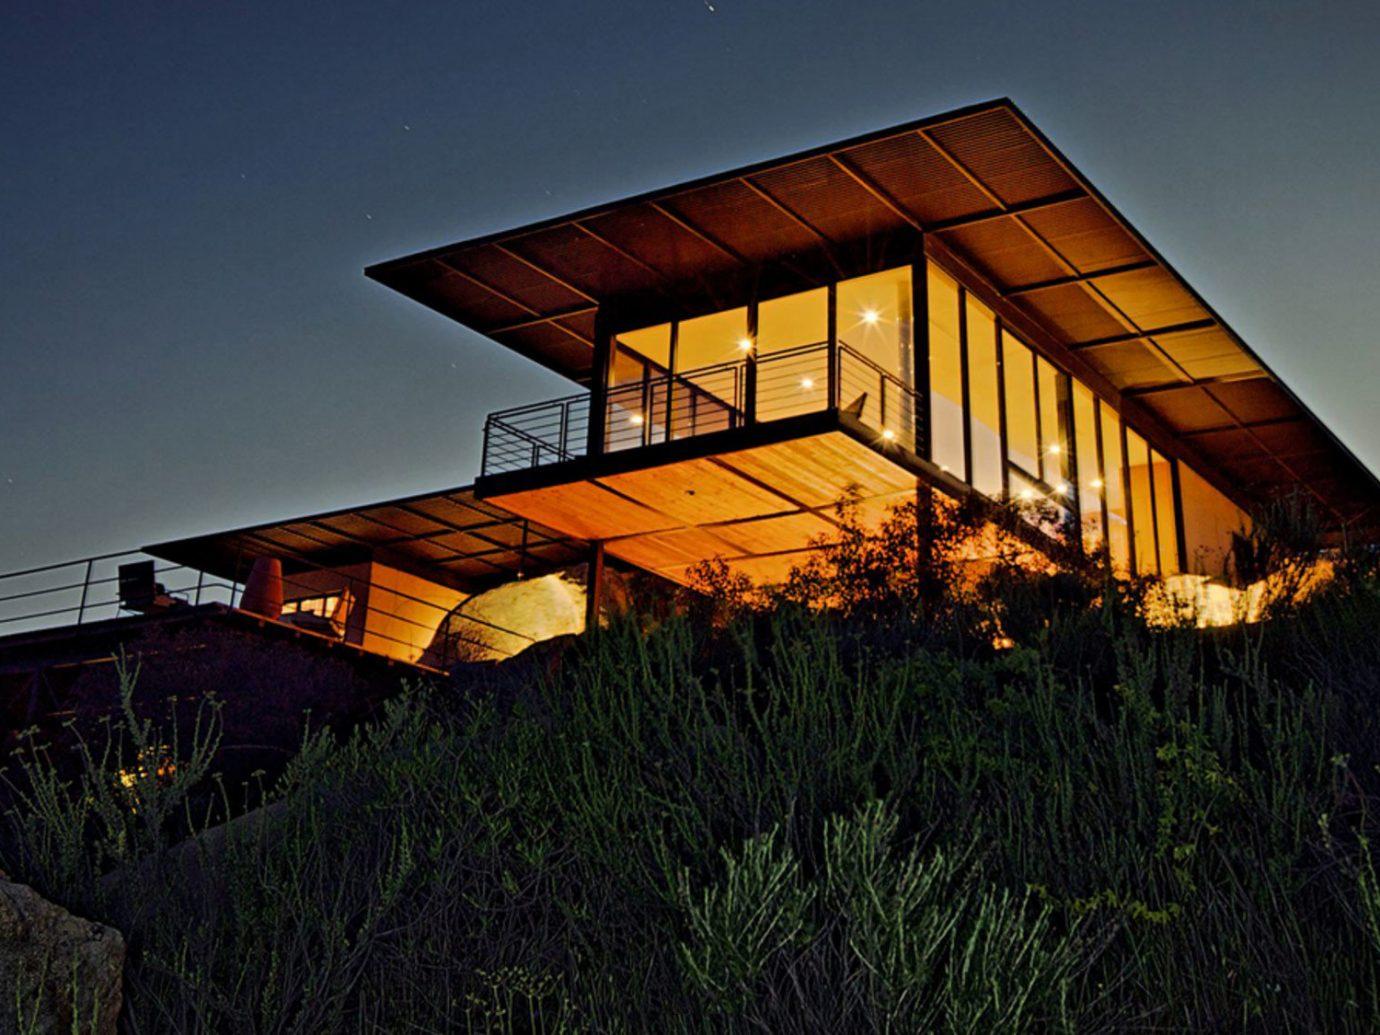 Trip Ideas sky outdoor grass night house light urban area Architecture evening lighting dusk sunlight Sunset lush hillside